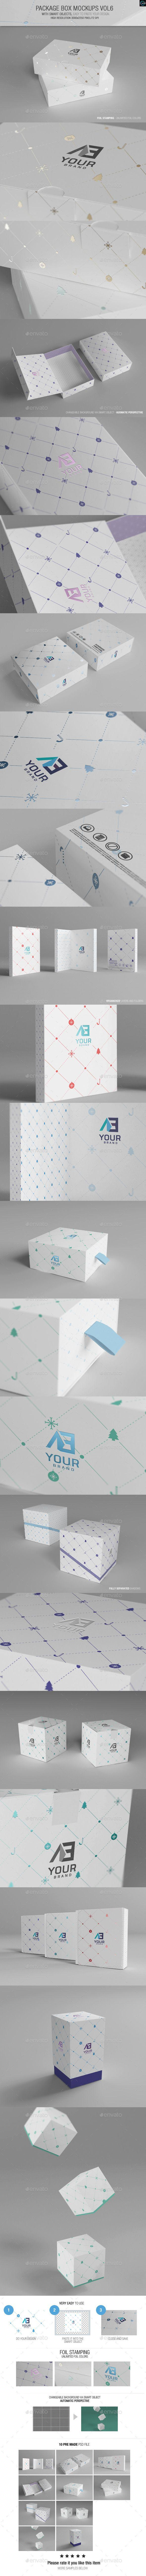 Package Box Mockups | Download: http://graphicriver.net/item/package-box-mockups-vol6/9533868?ref=ksioks